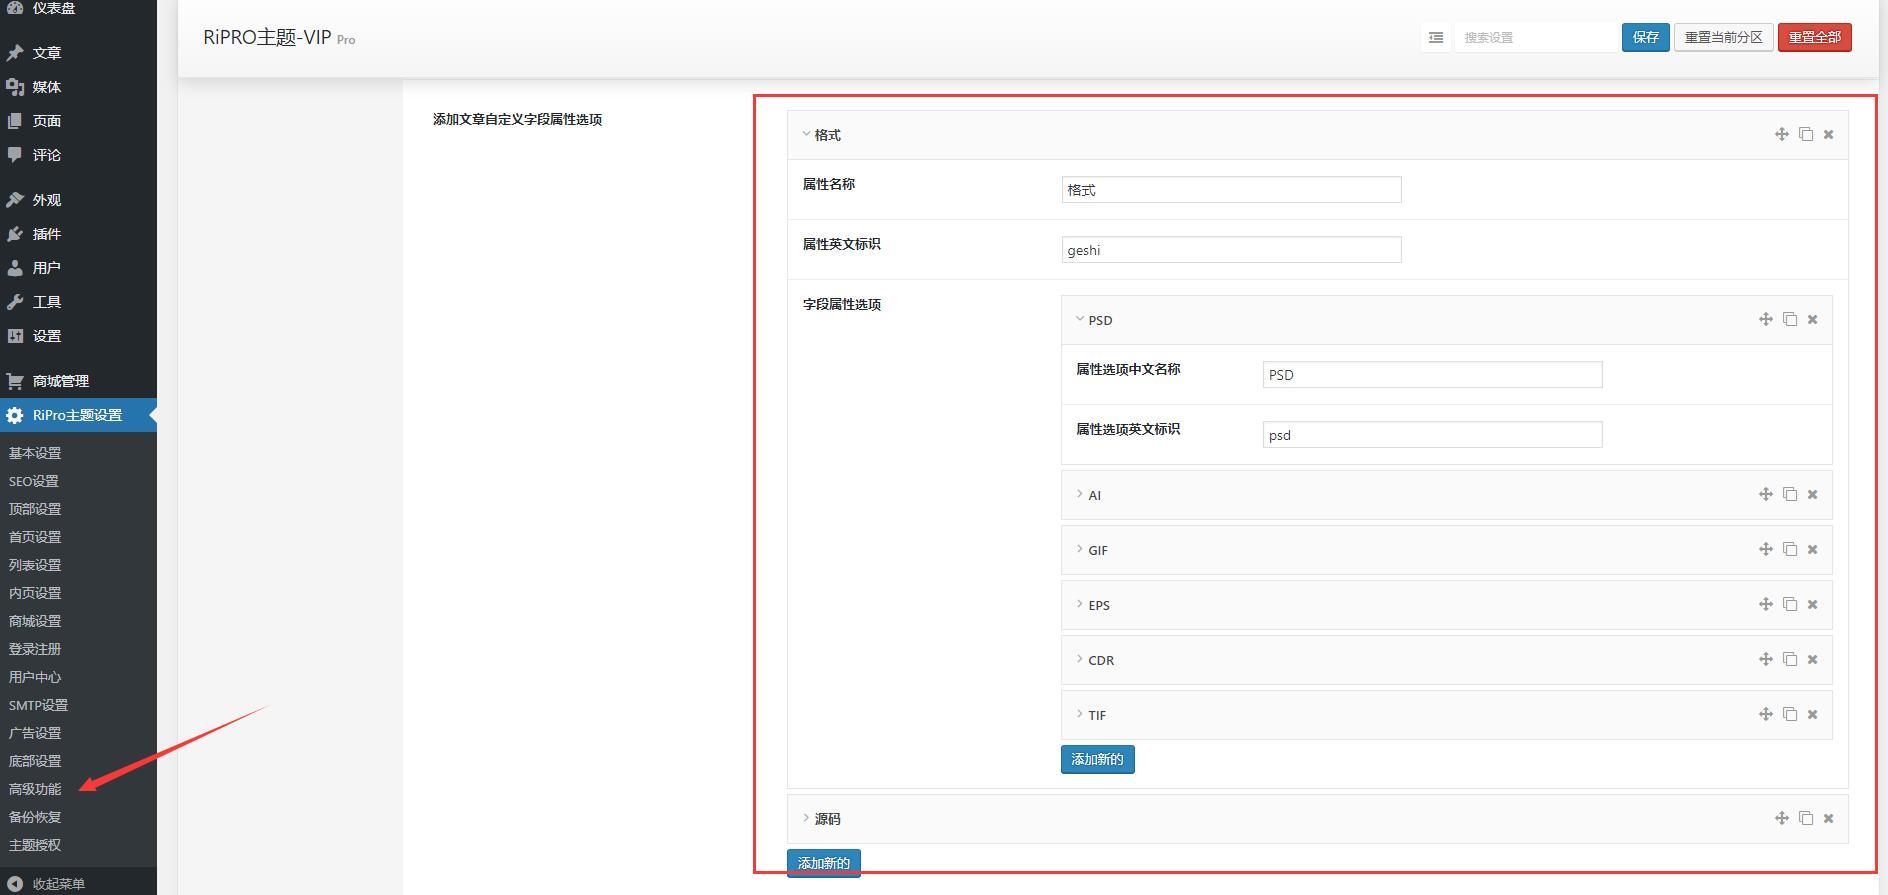 【WordPress美化】Ripro主题高级筛选和文章自定义属性字段-玖居暗巷